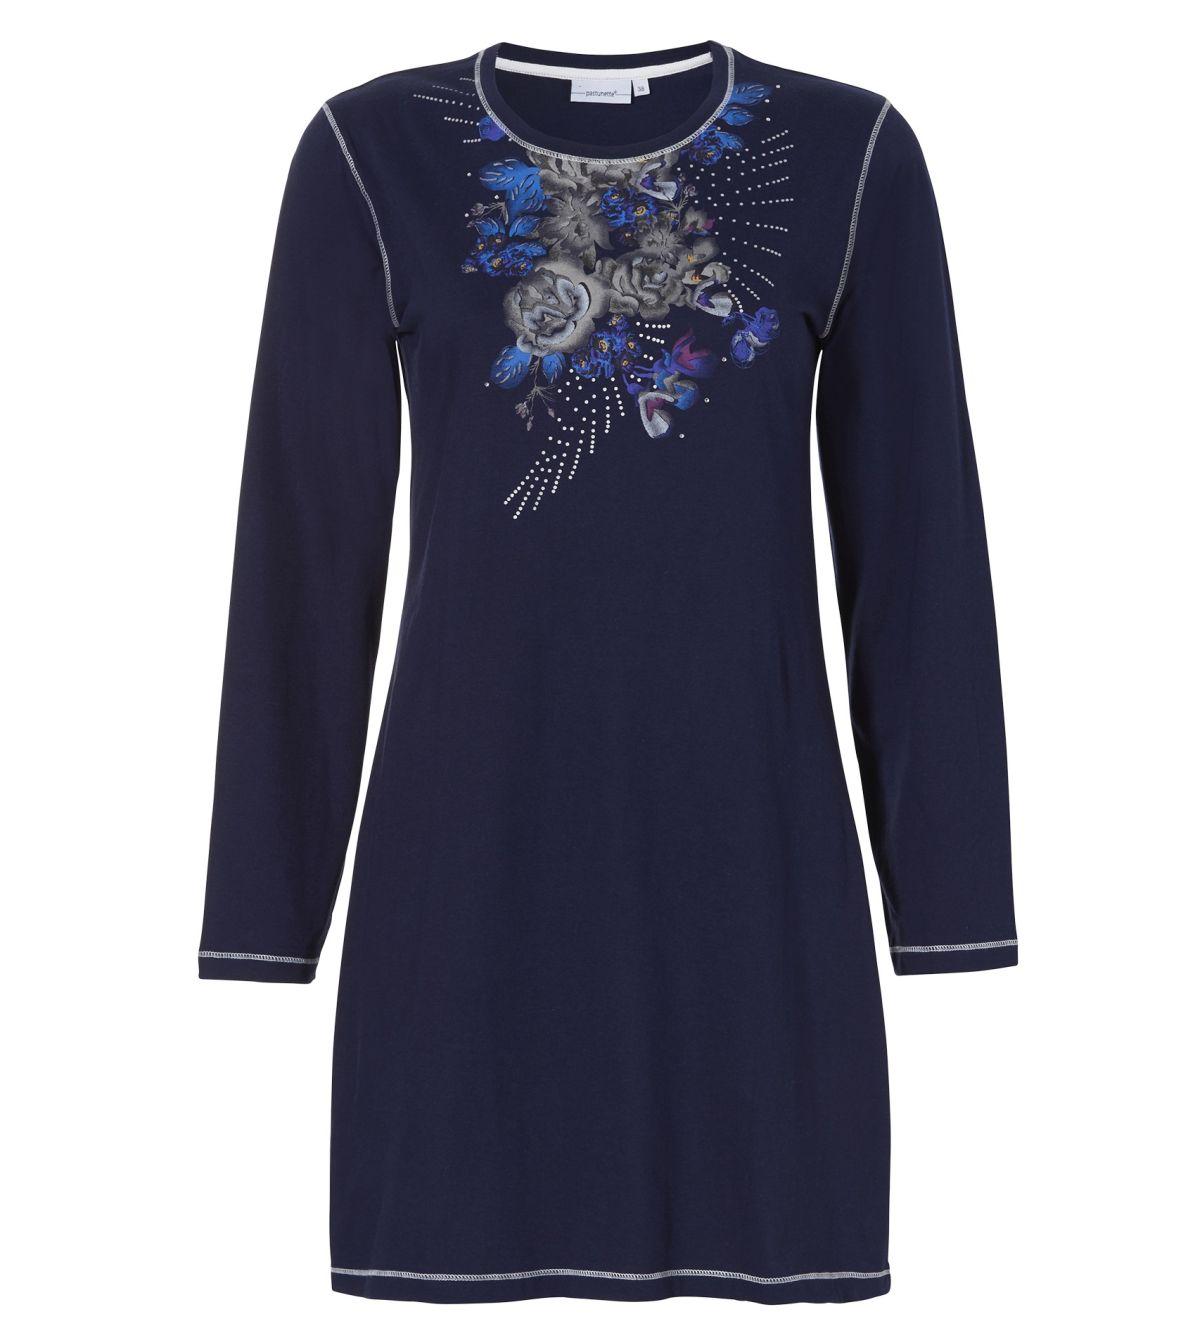 Damesnachthemd Medium Donkerblauw Bloemen